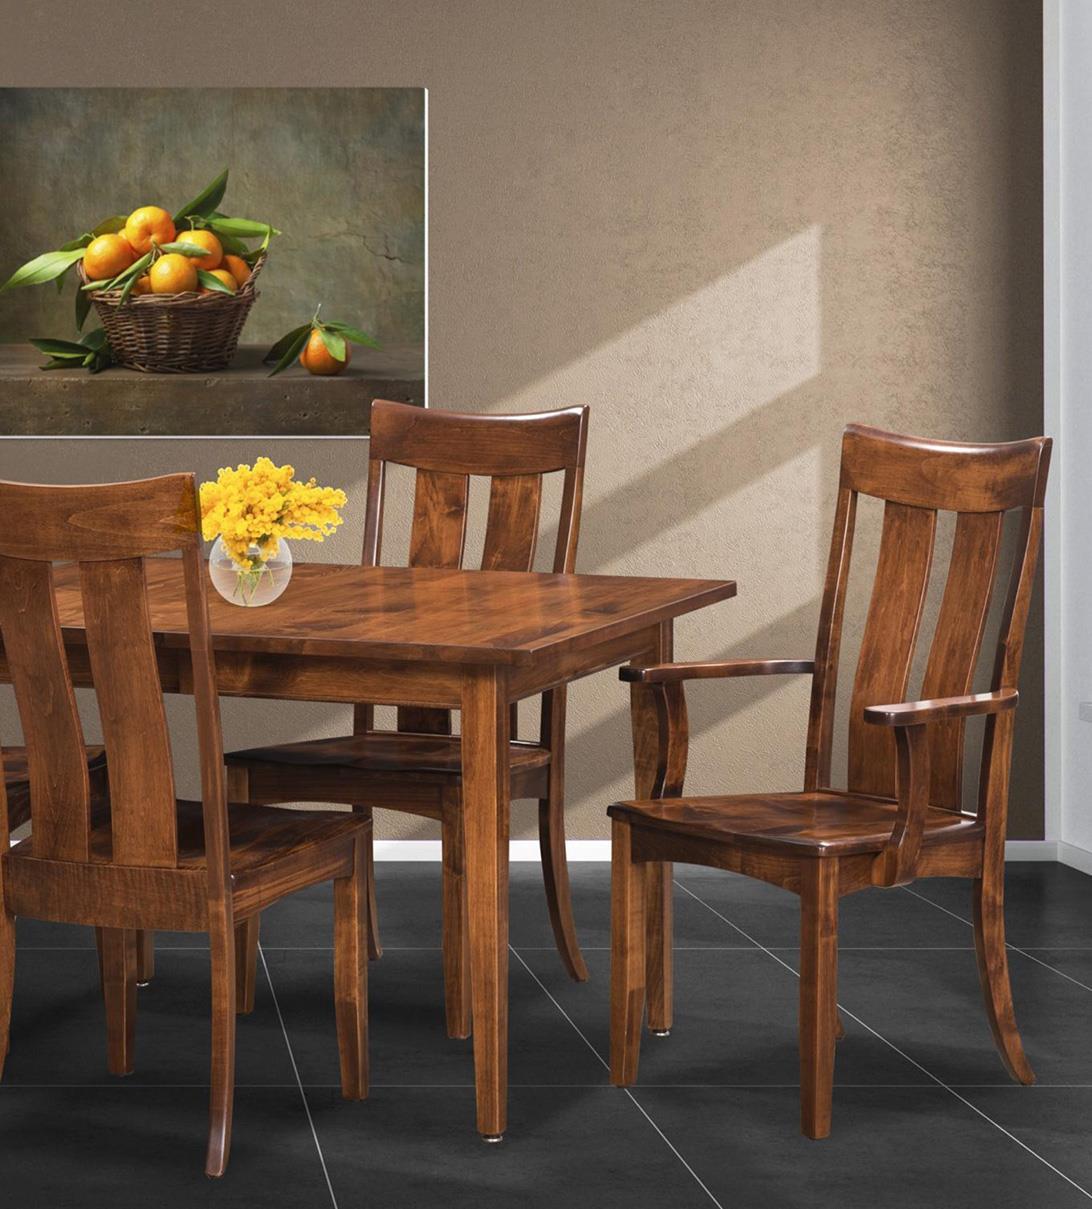 5-Piece Customizable Table & Chair Set